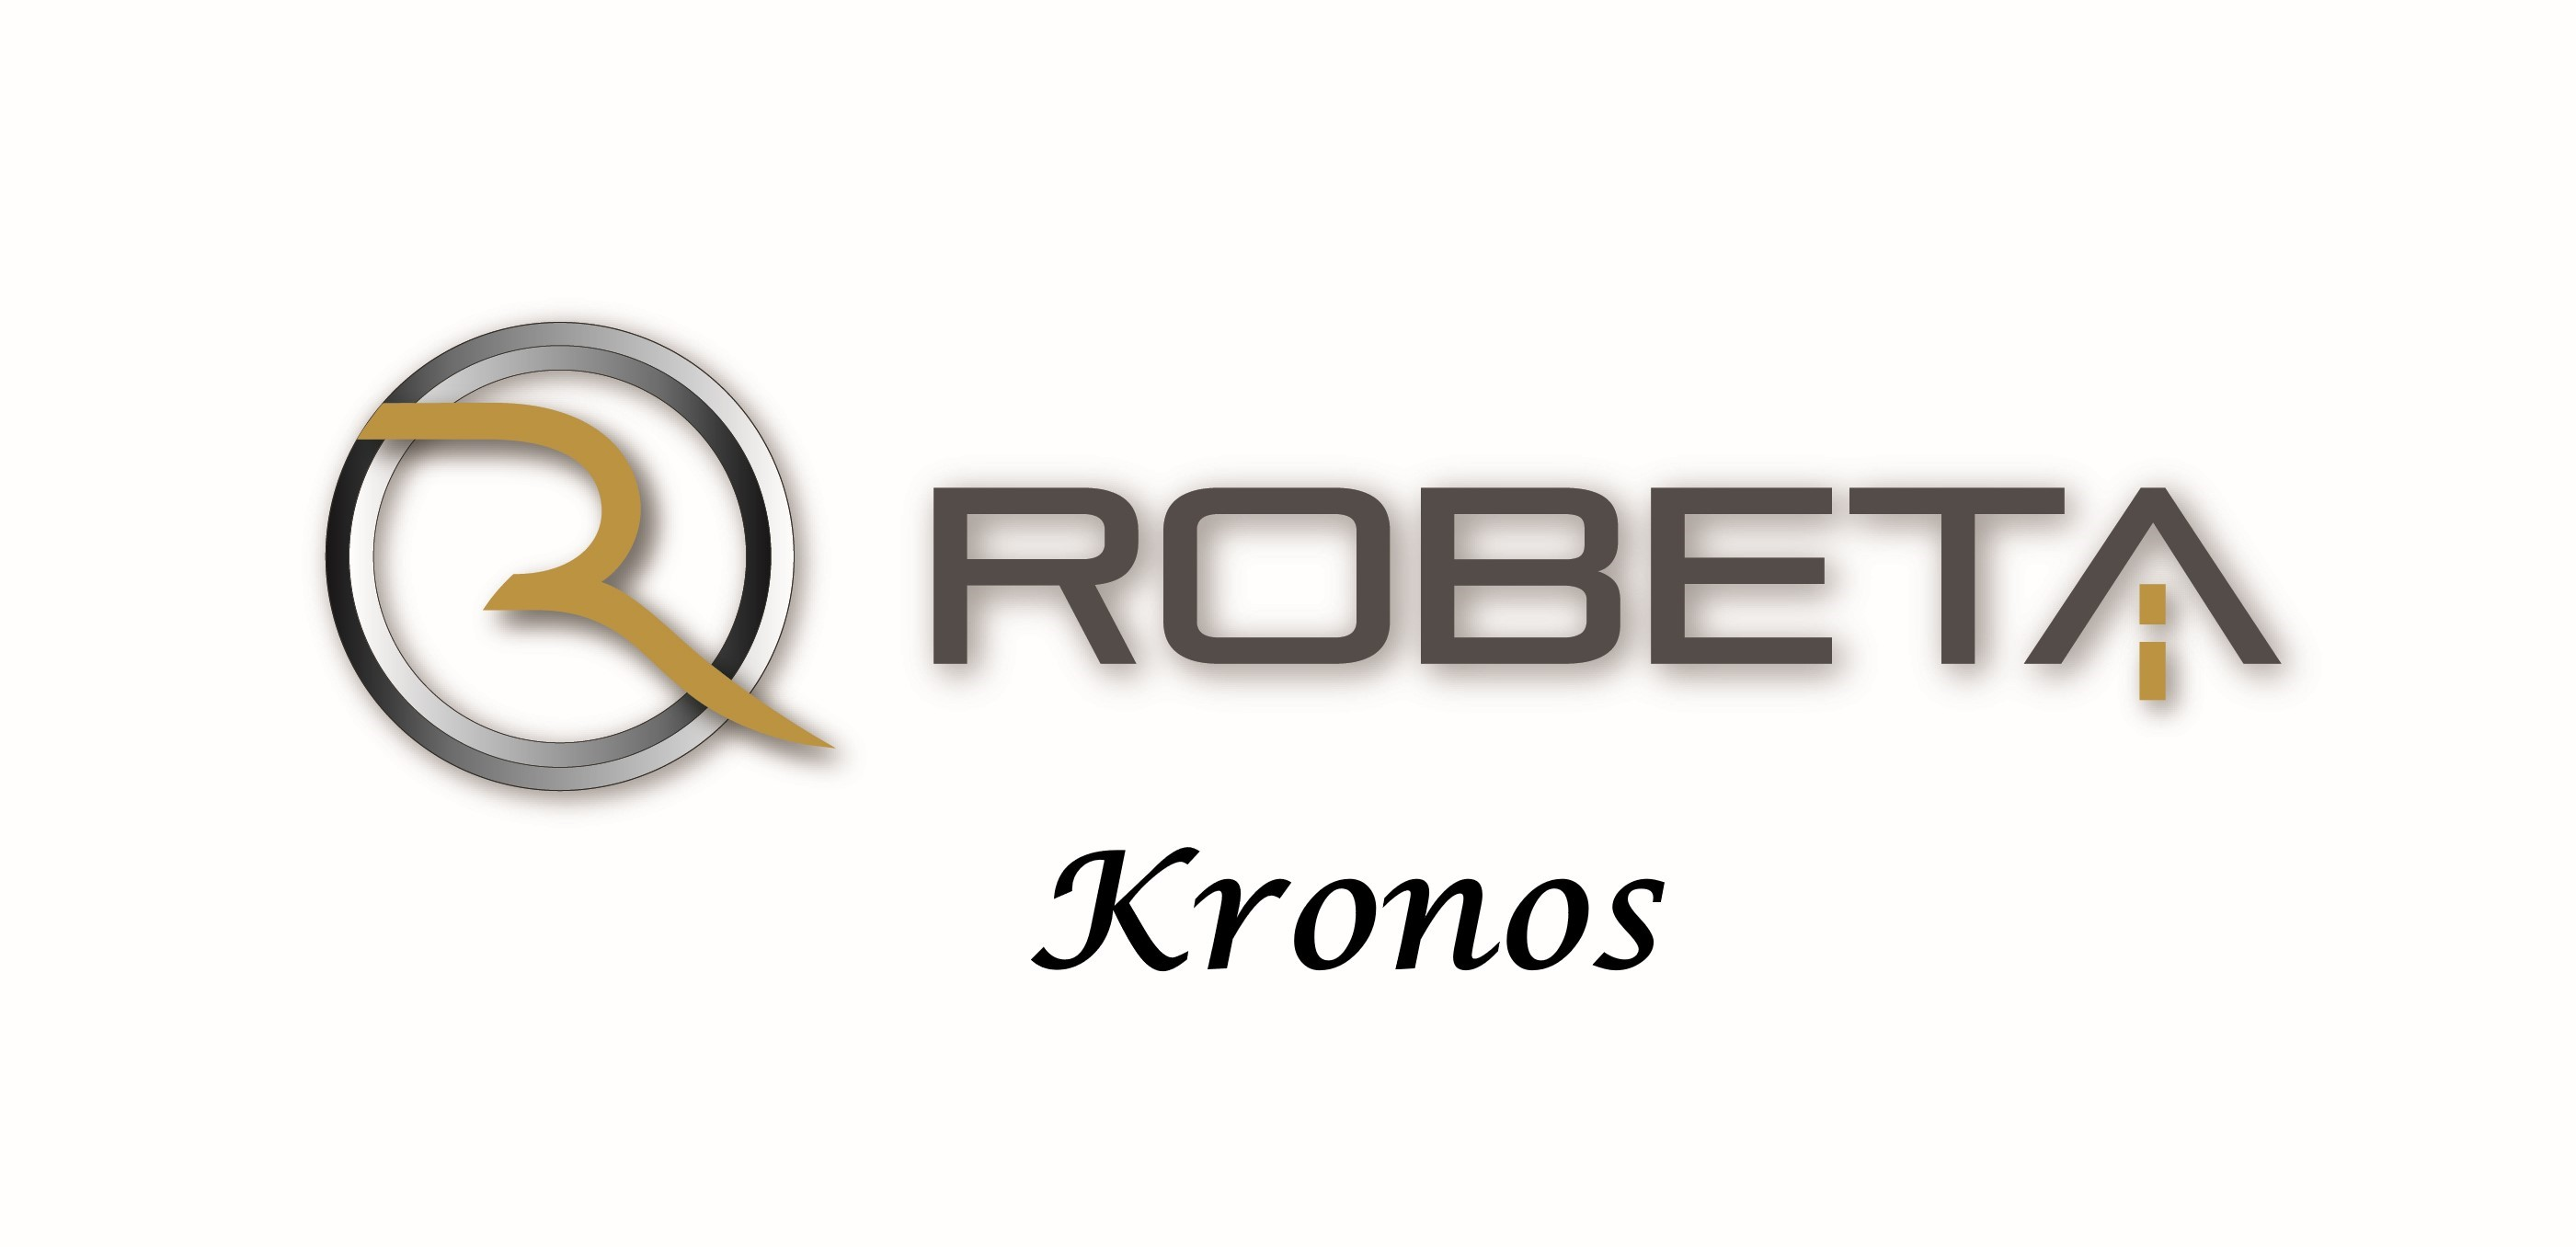 ROBETA Kronos (2)